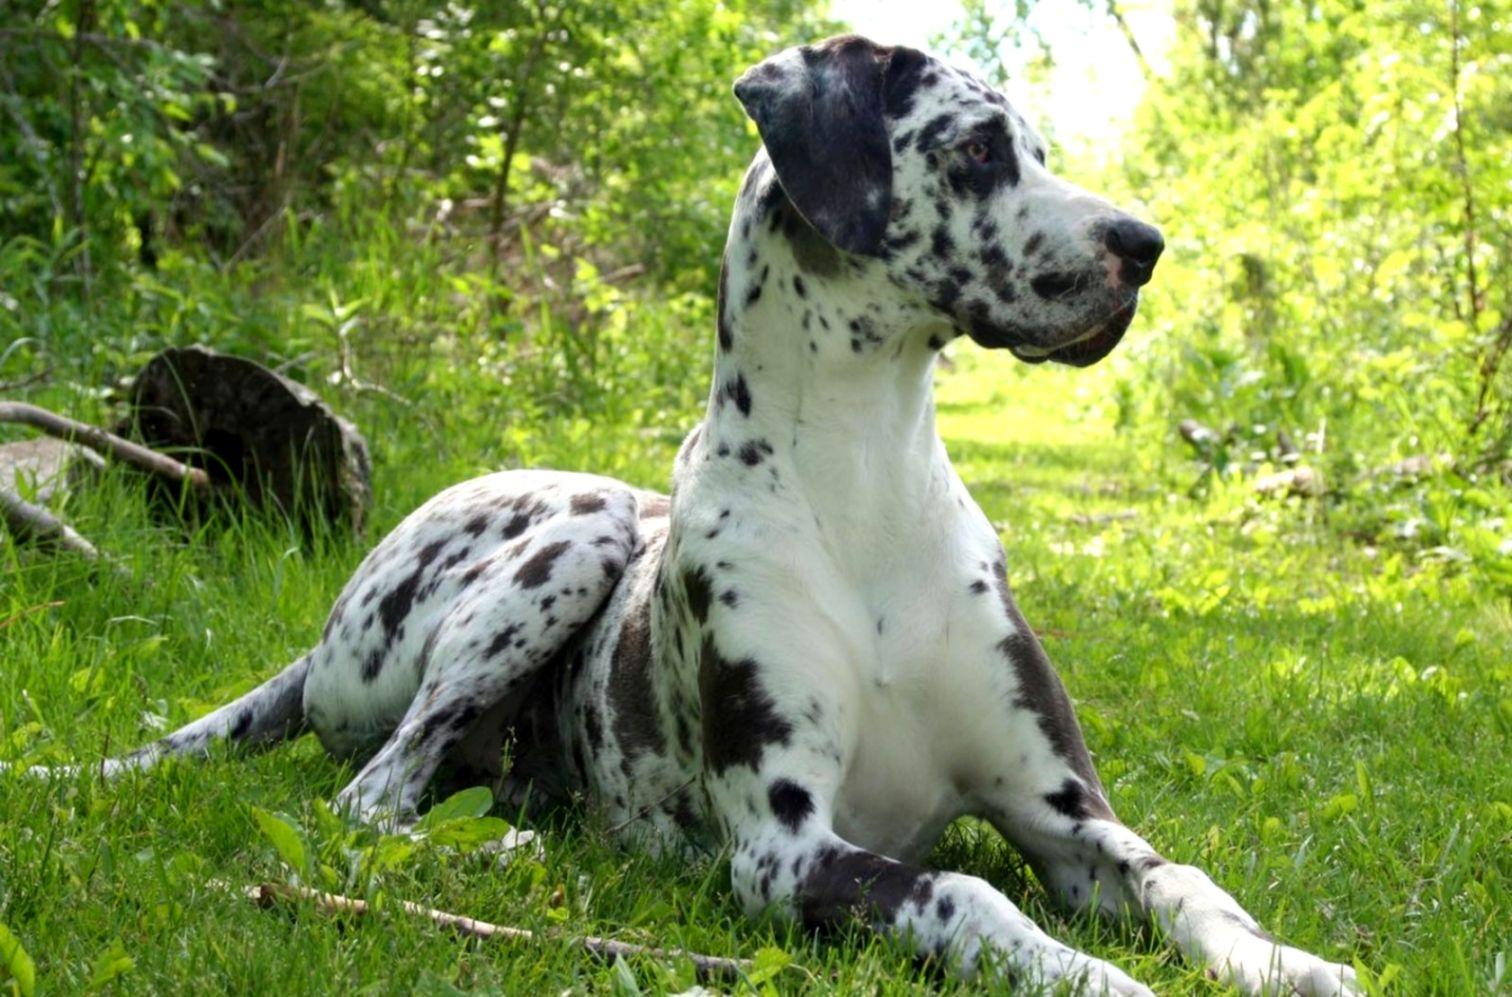 Beautiful Bullmastiff Dog Hd Images Desktop Wallpapers Of Dogs 1512x997